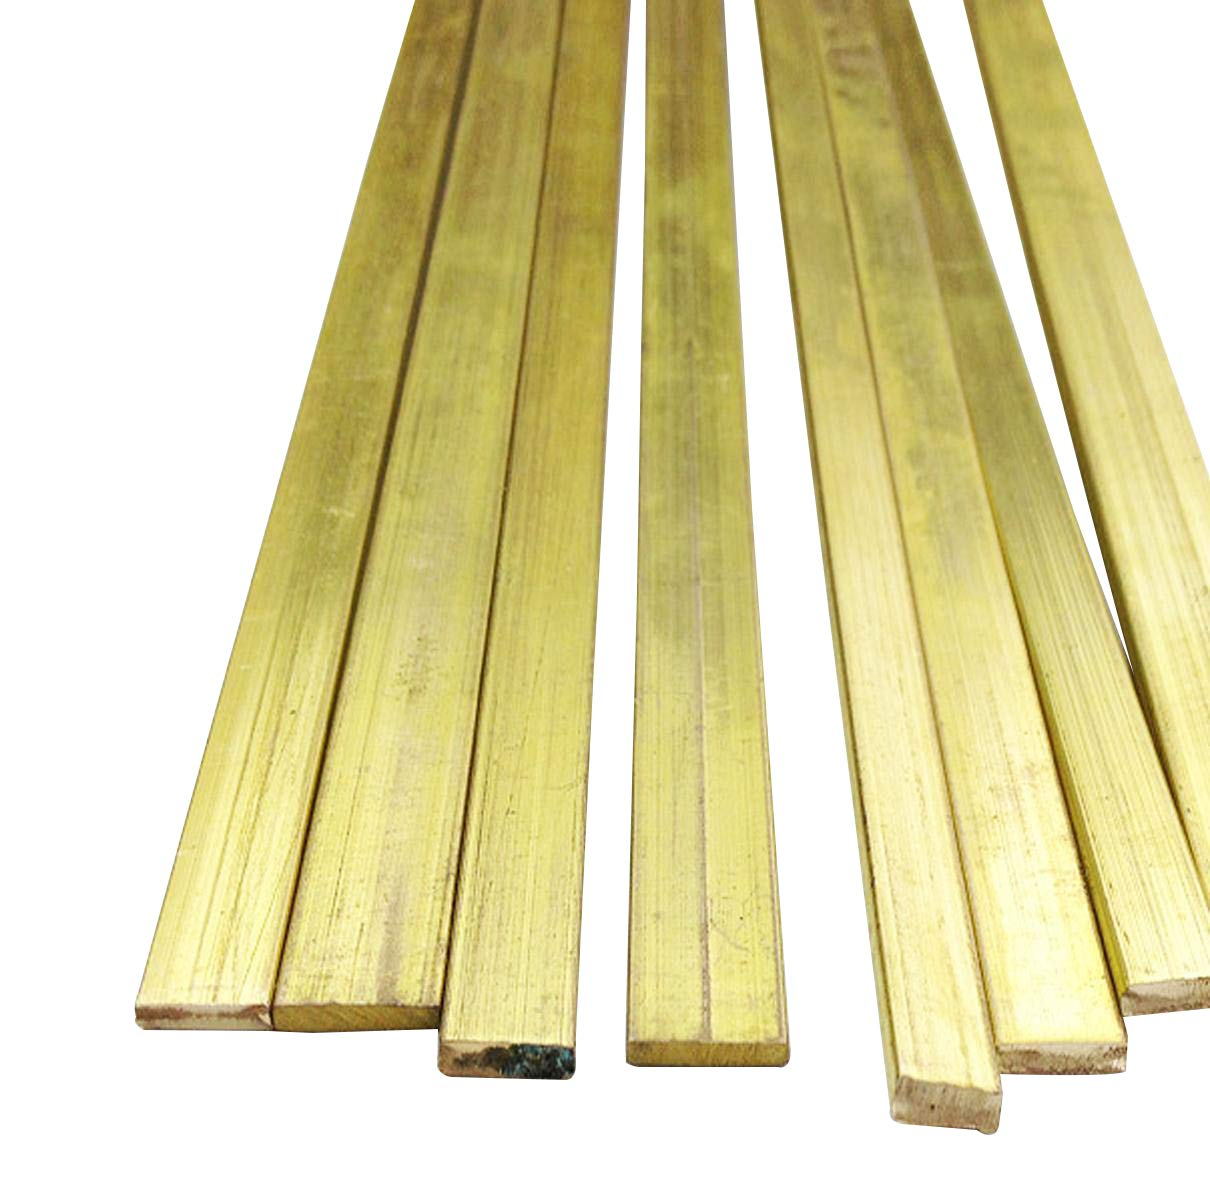 2pcs C360 Brass Flat Bar Sheet 3mm x 12mm x 250mm